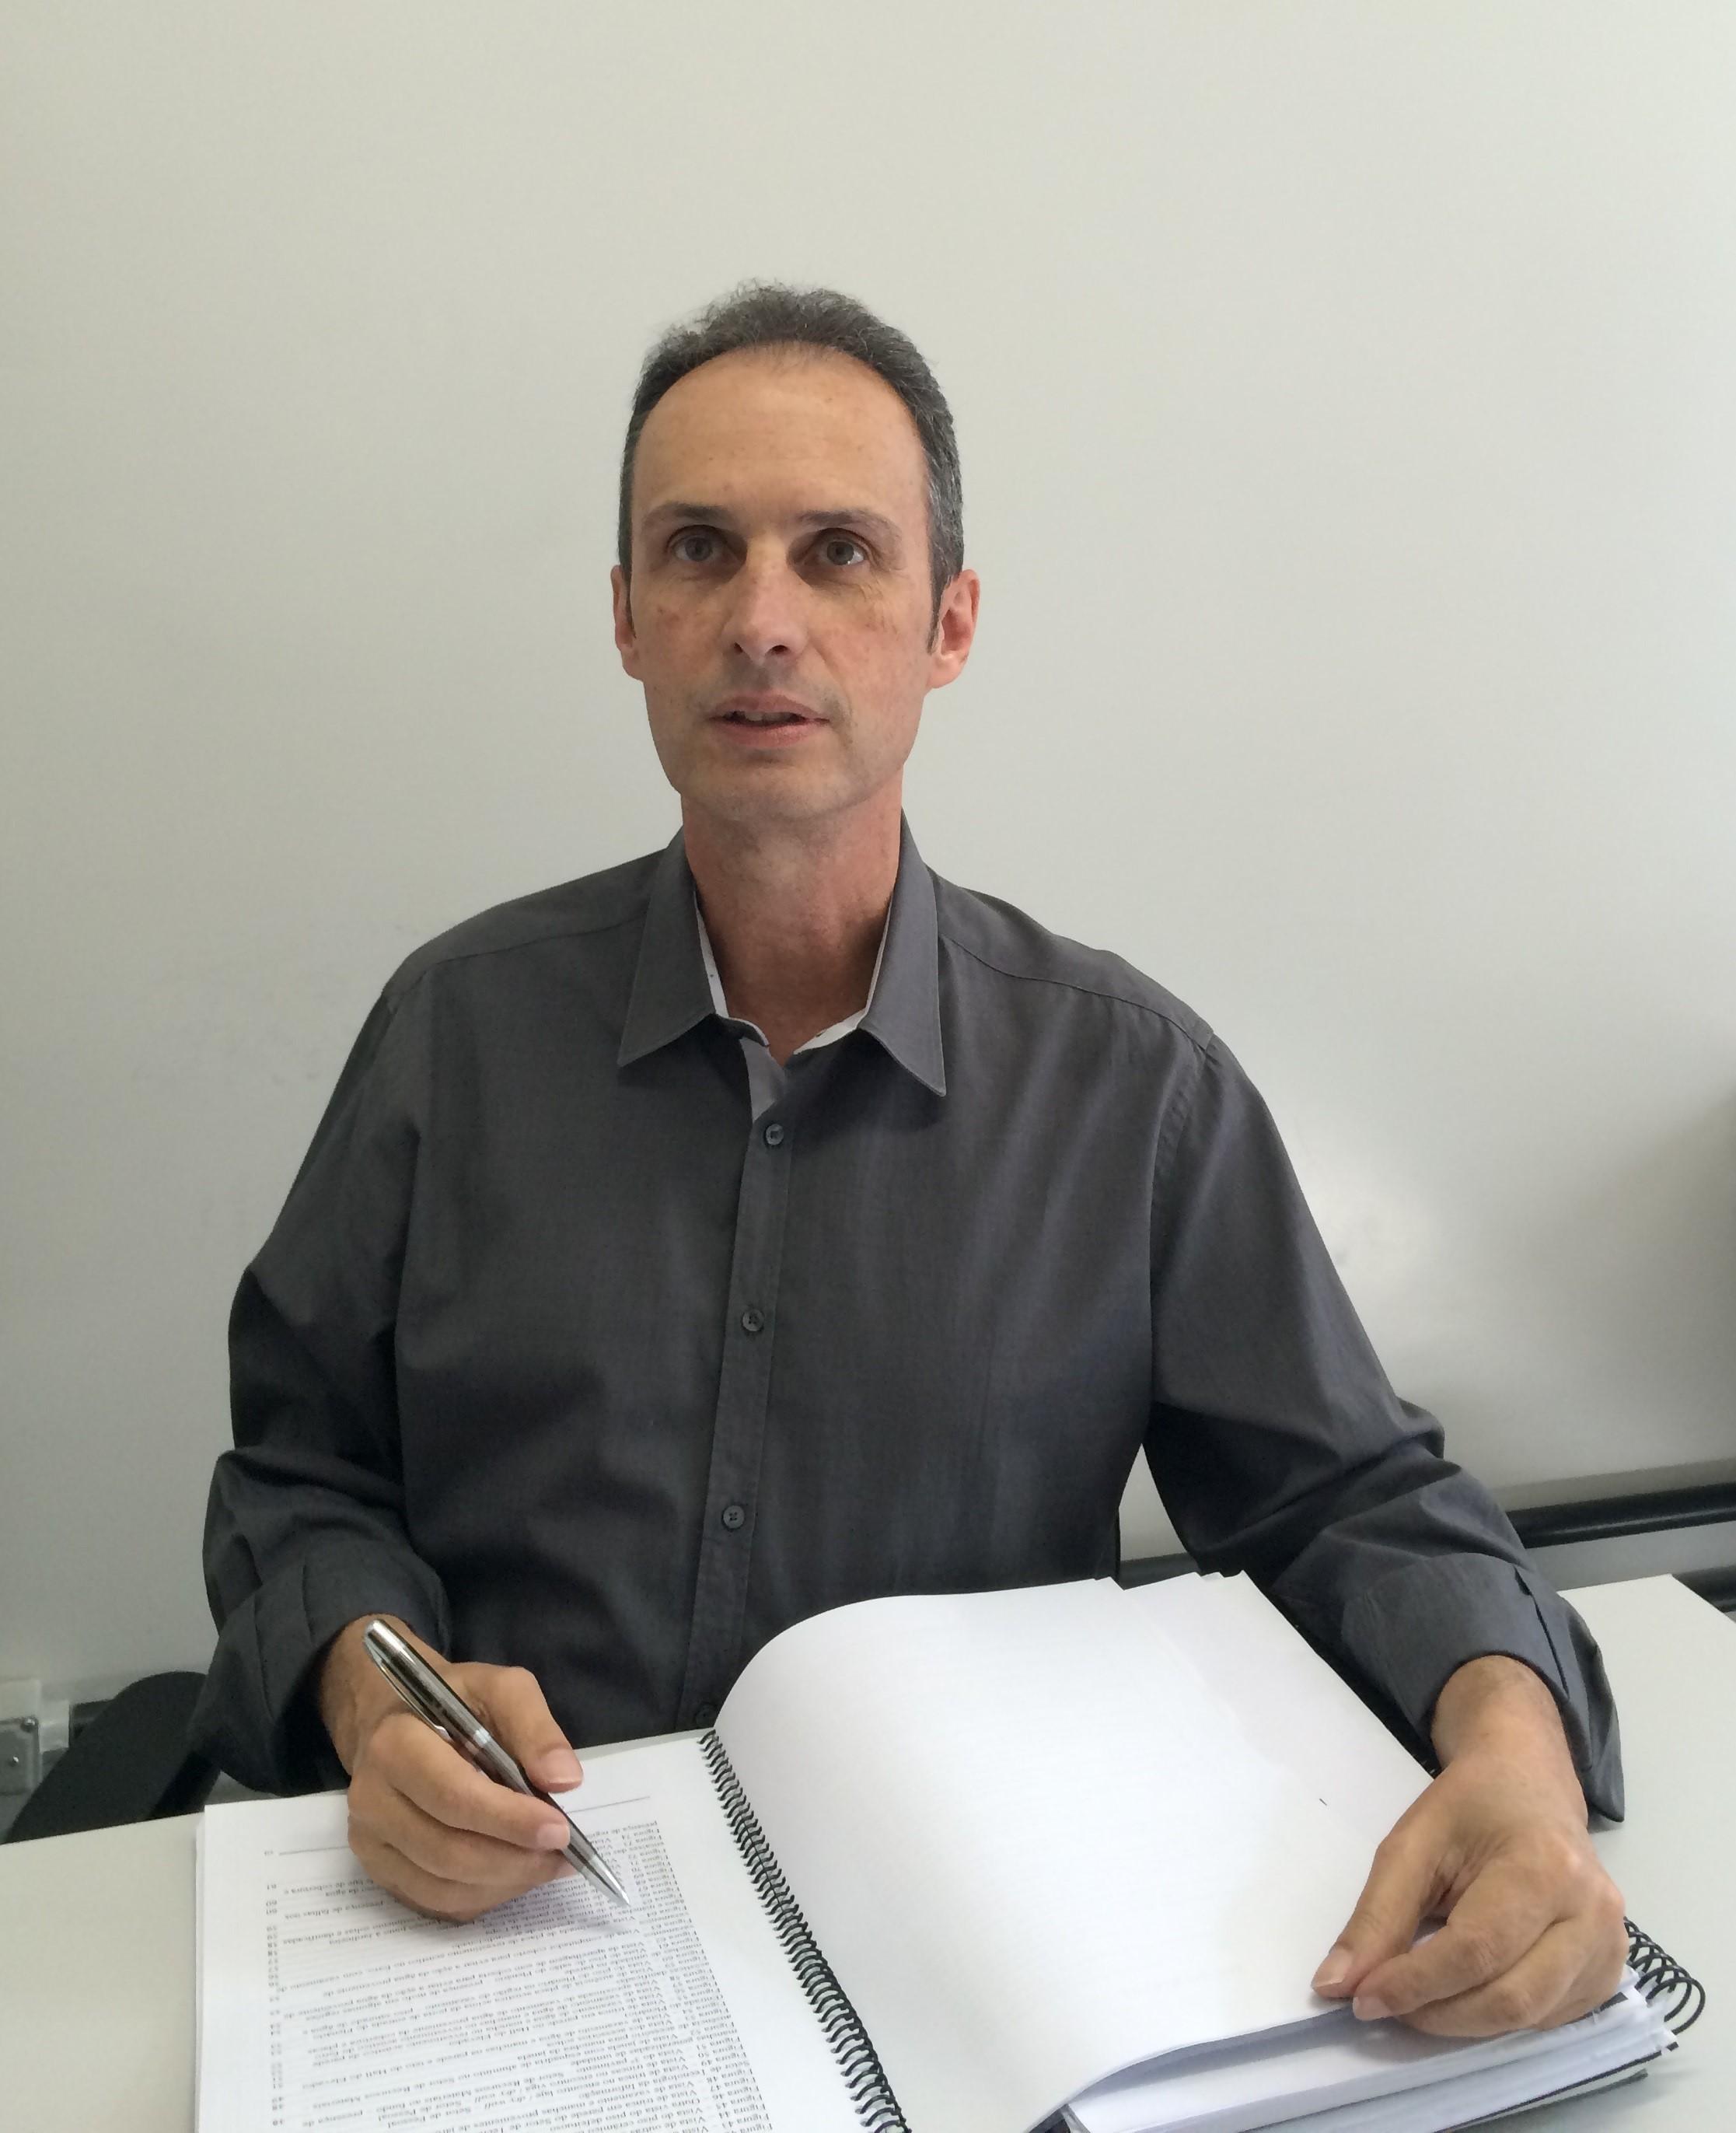 PD. SC. LUIZ ANTÔNIO MELGAÇO NUNES BRANCO